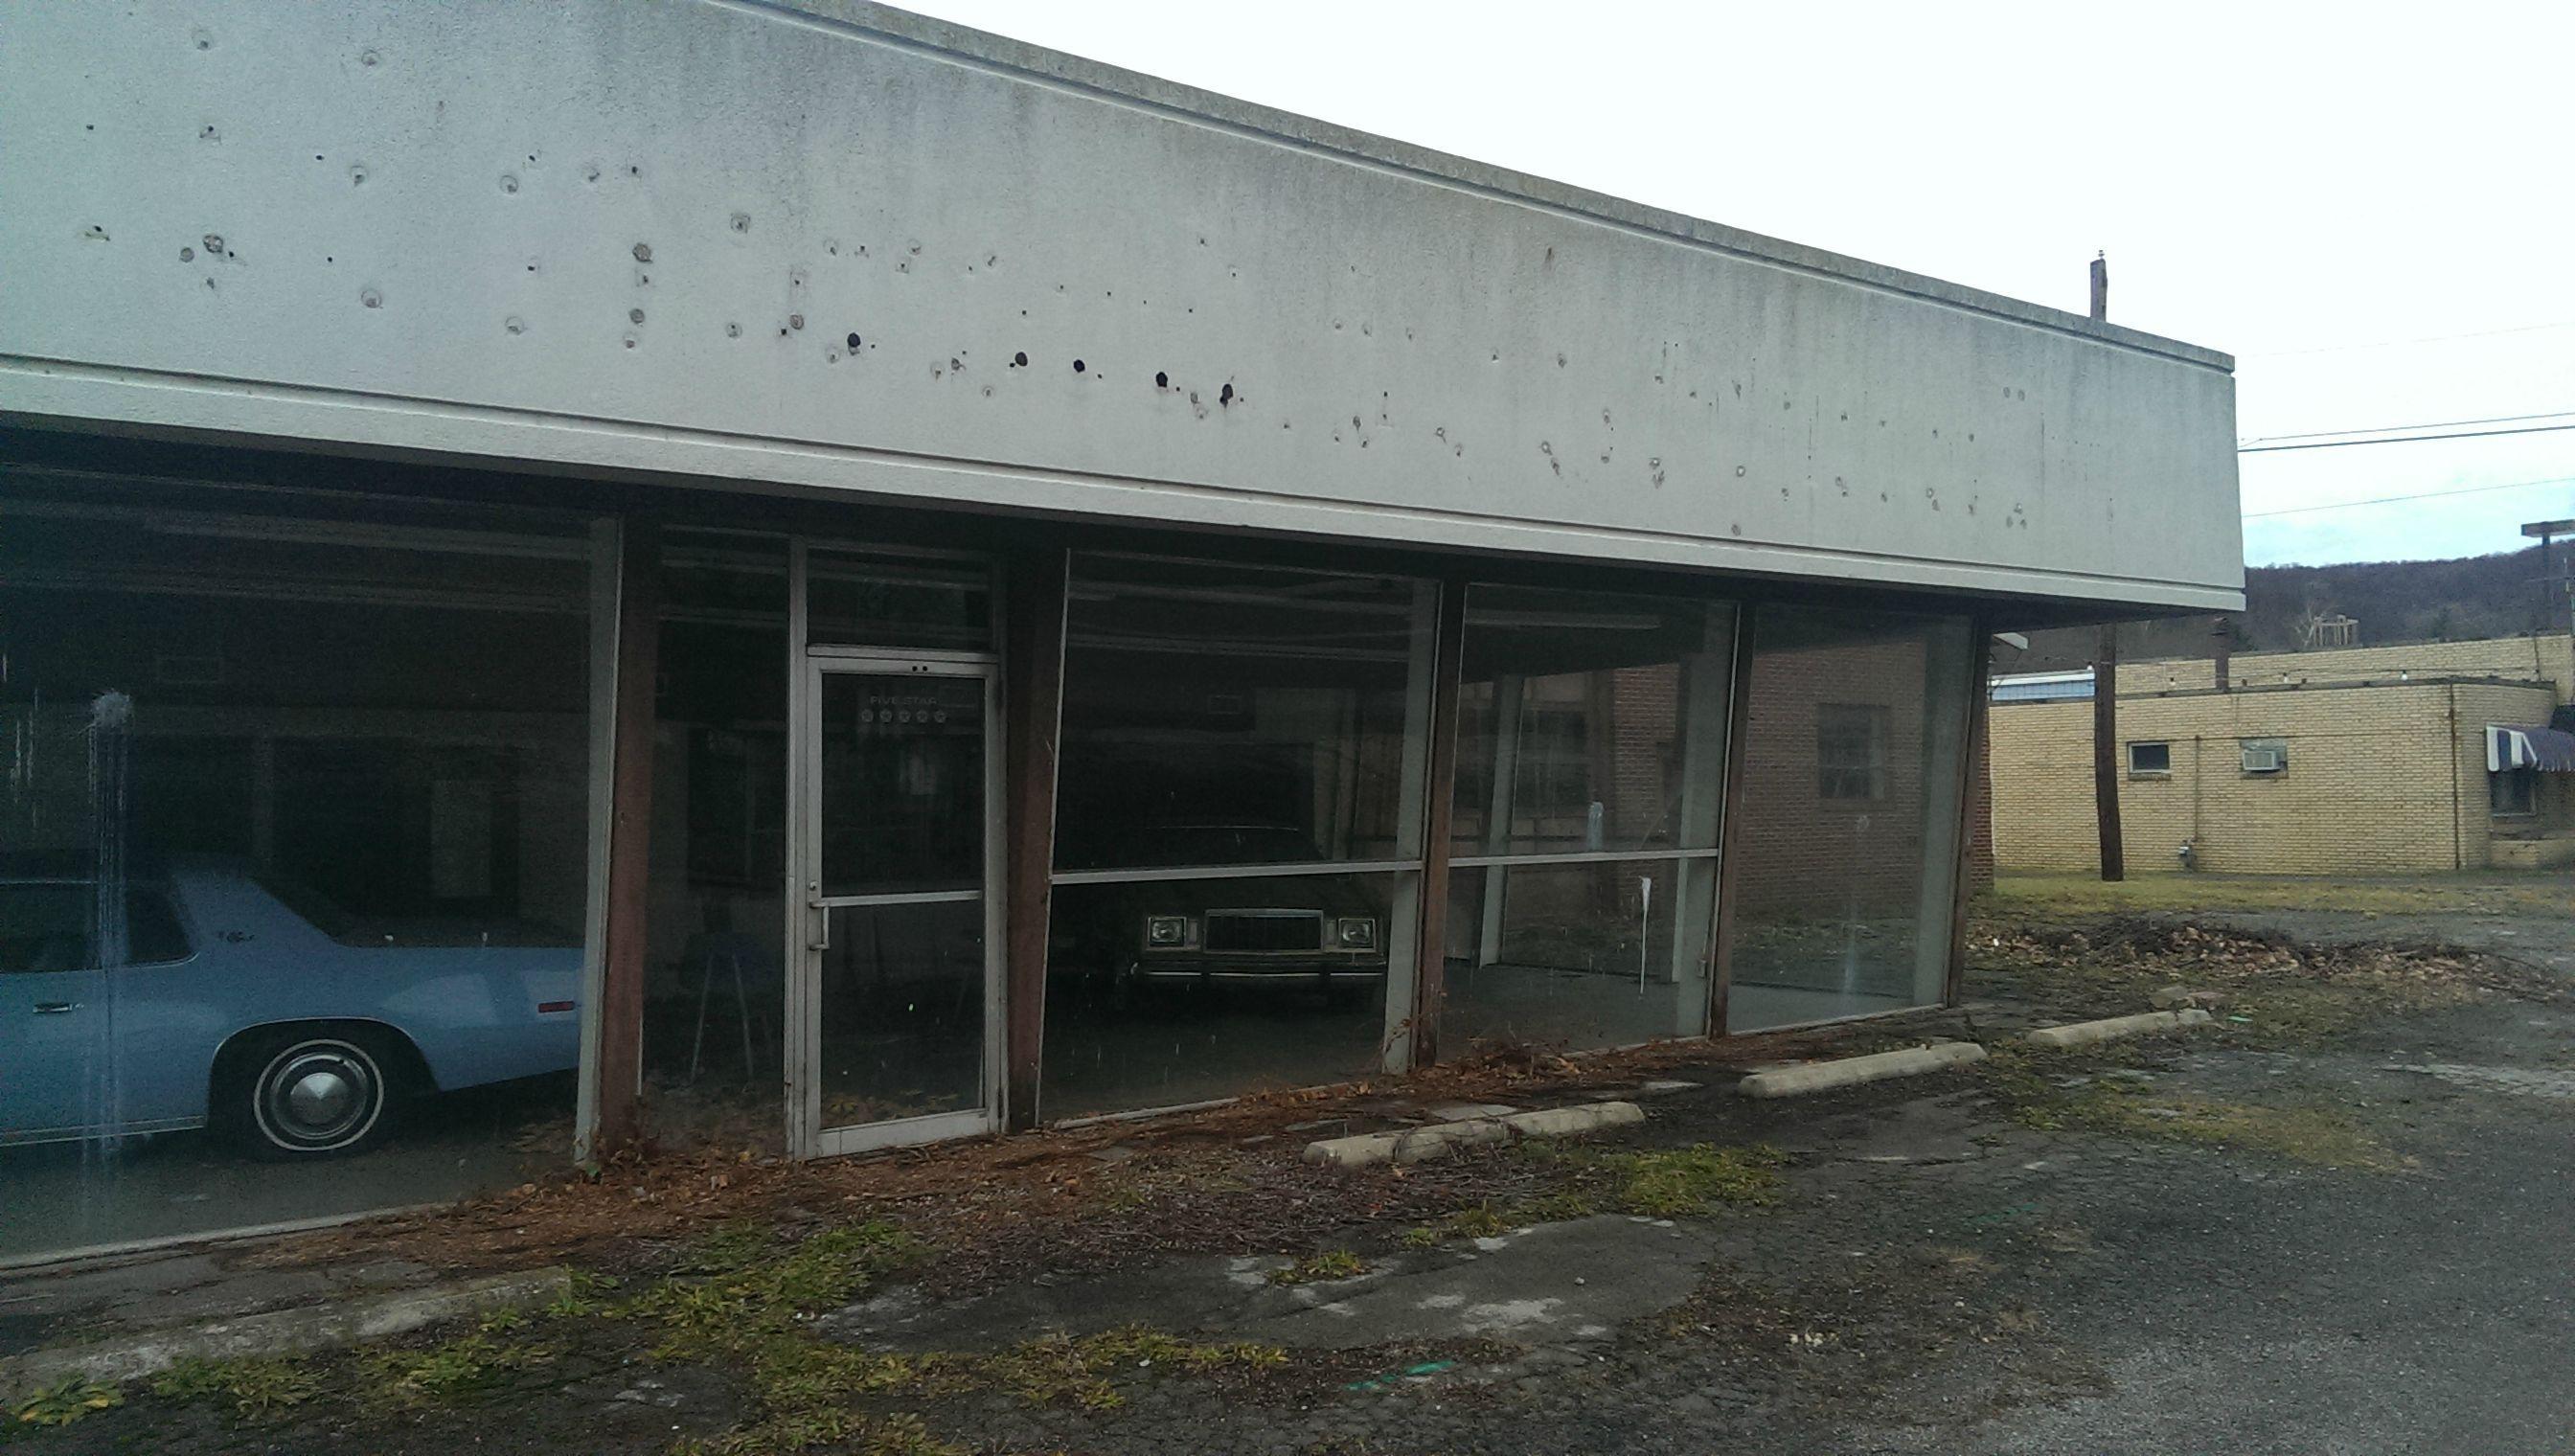 columbus group dealership chrysler automotive ricart express oh ohio groveport home service